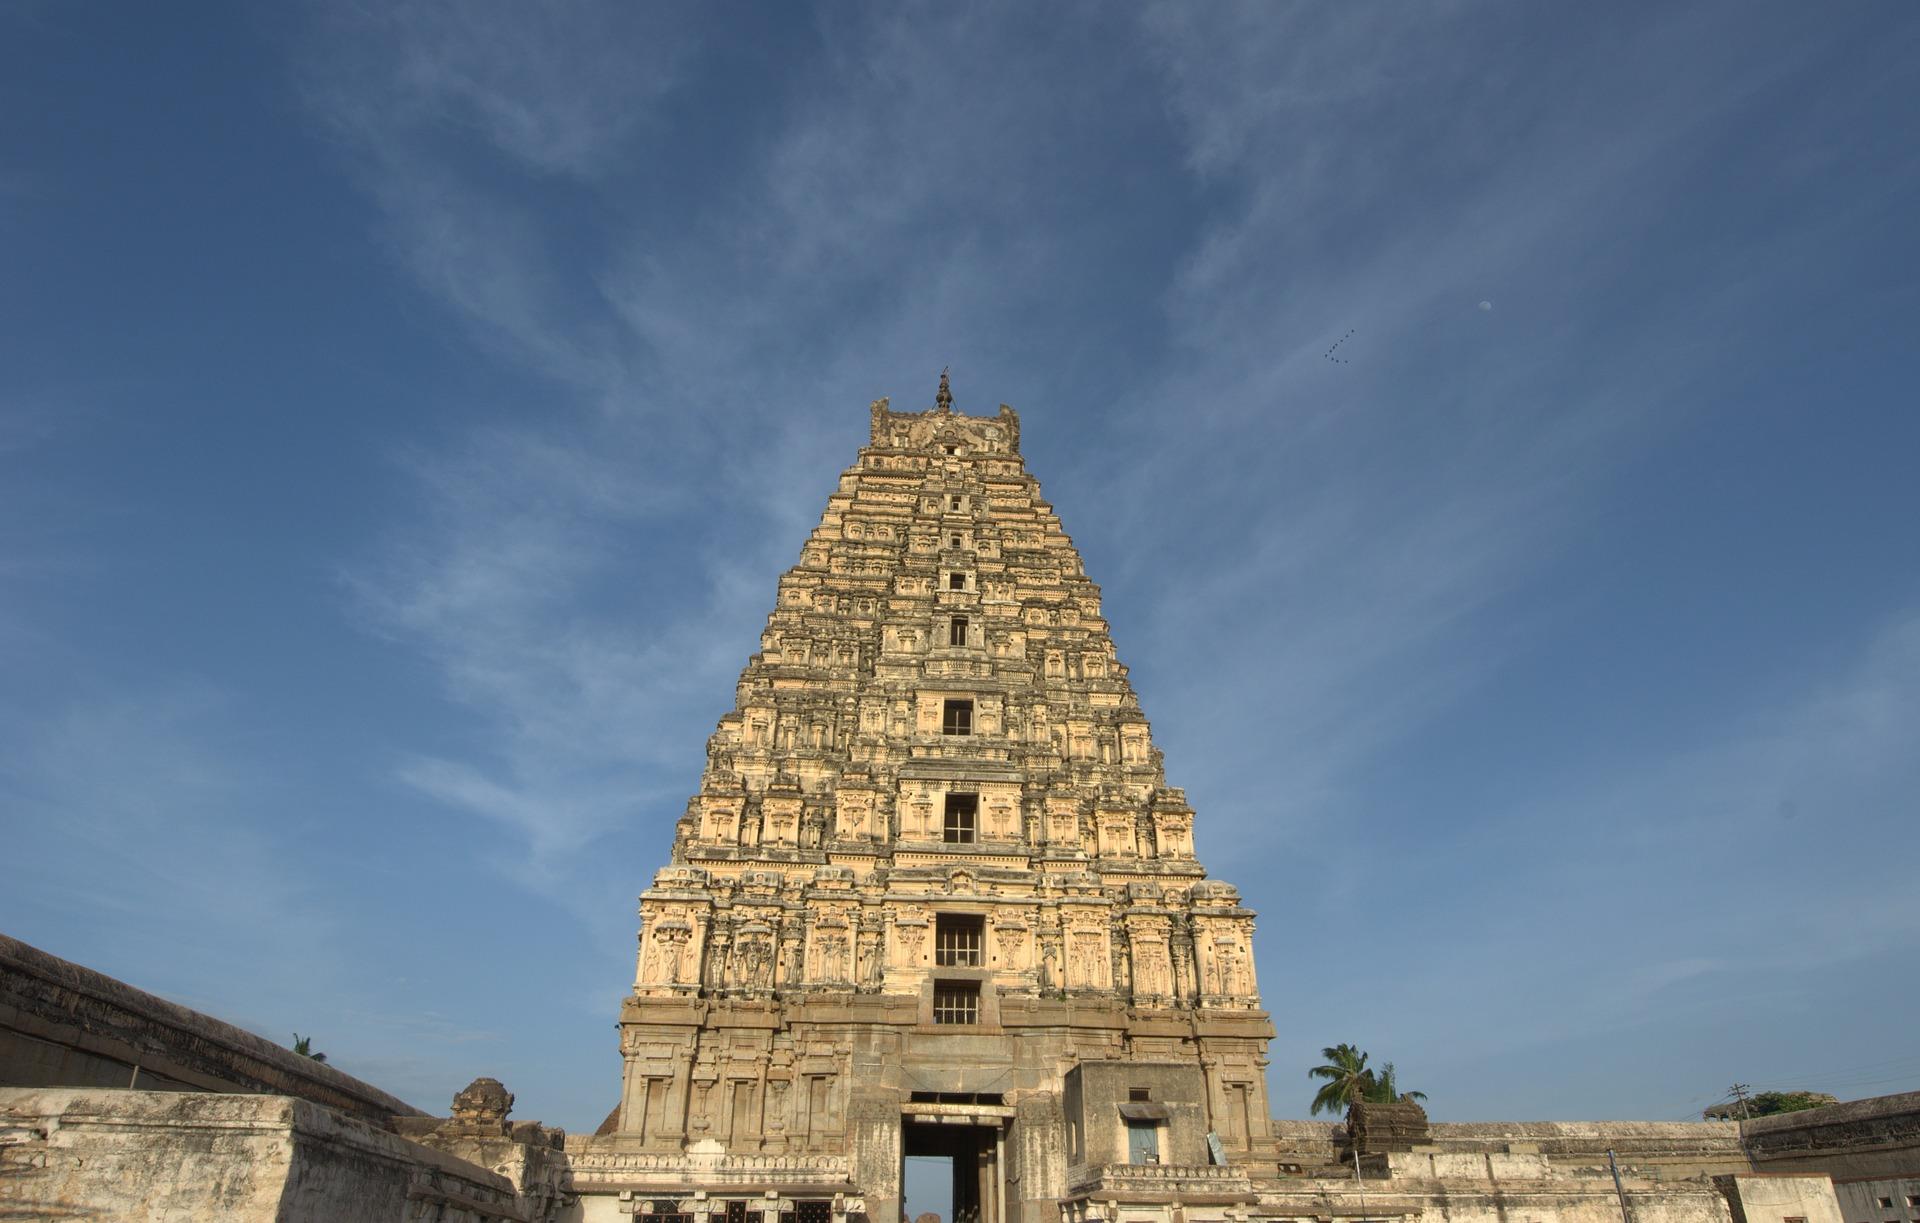 Sri Virupaksha Temple - A Three-Day Trip To Hampi With Friends